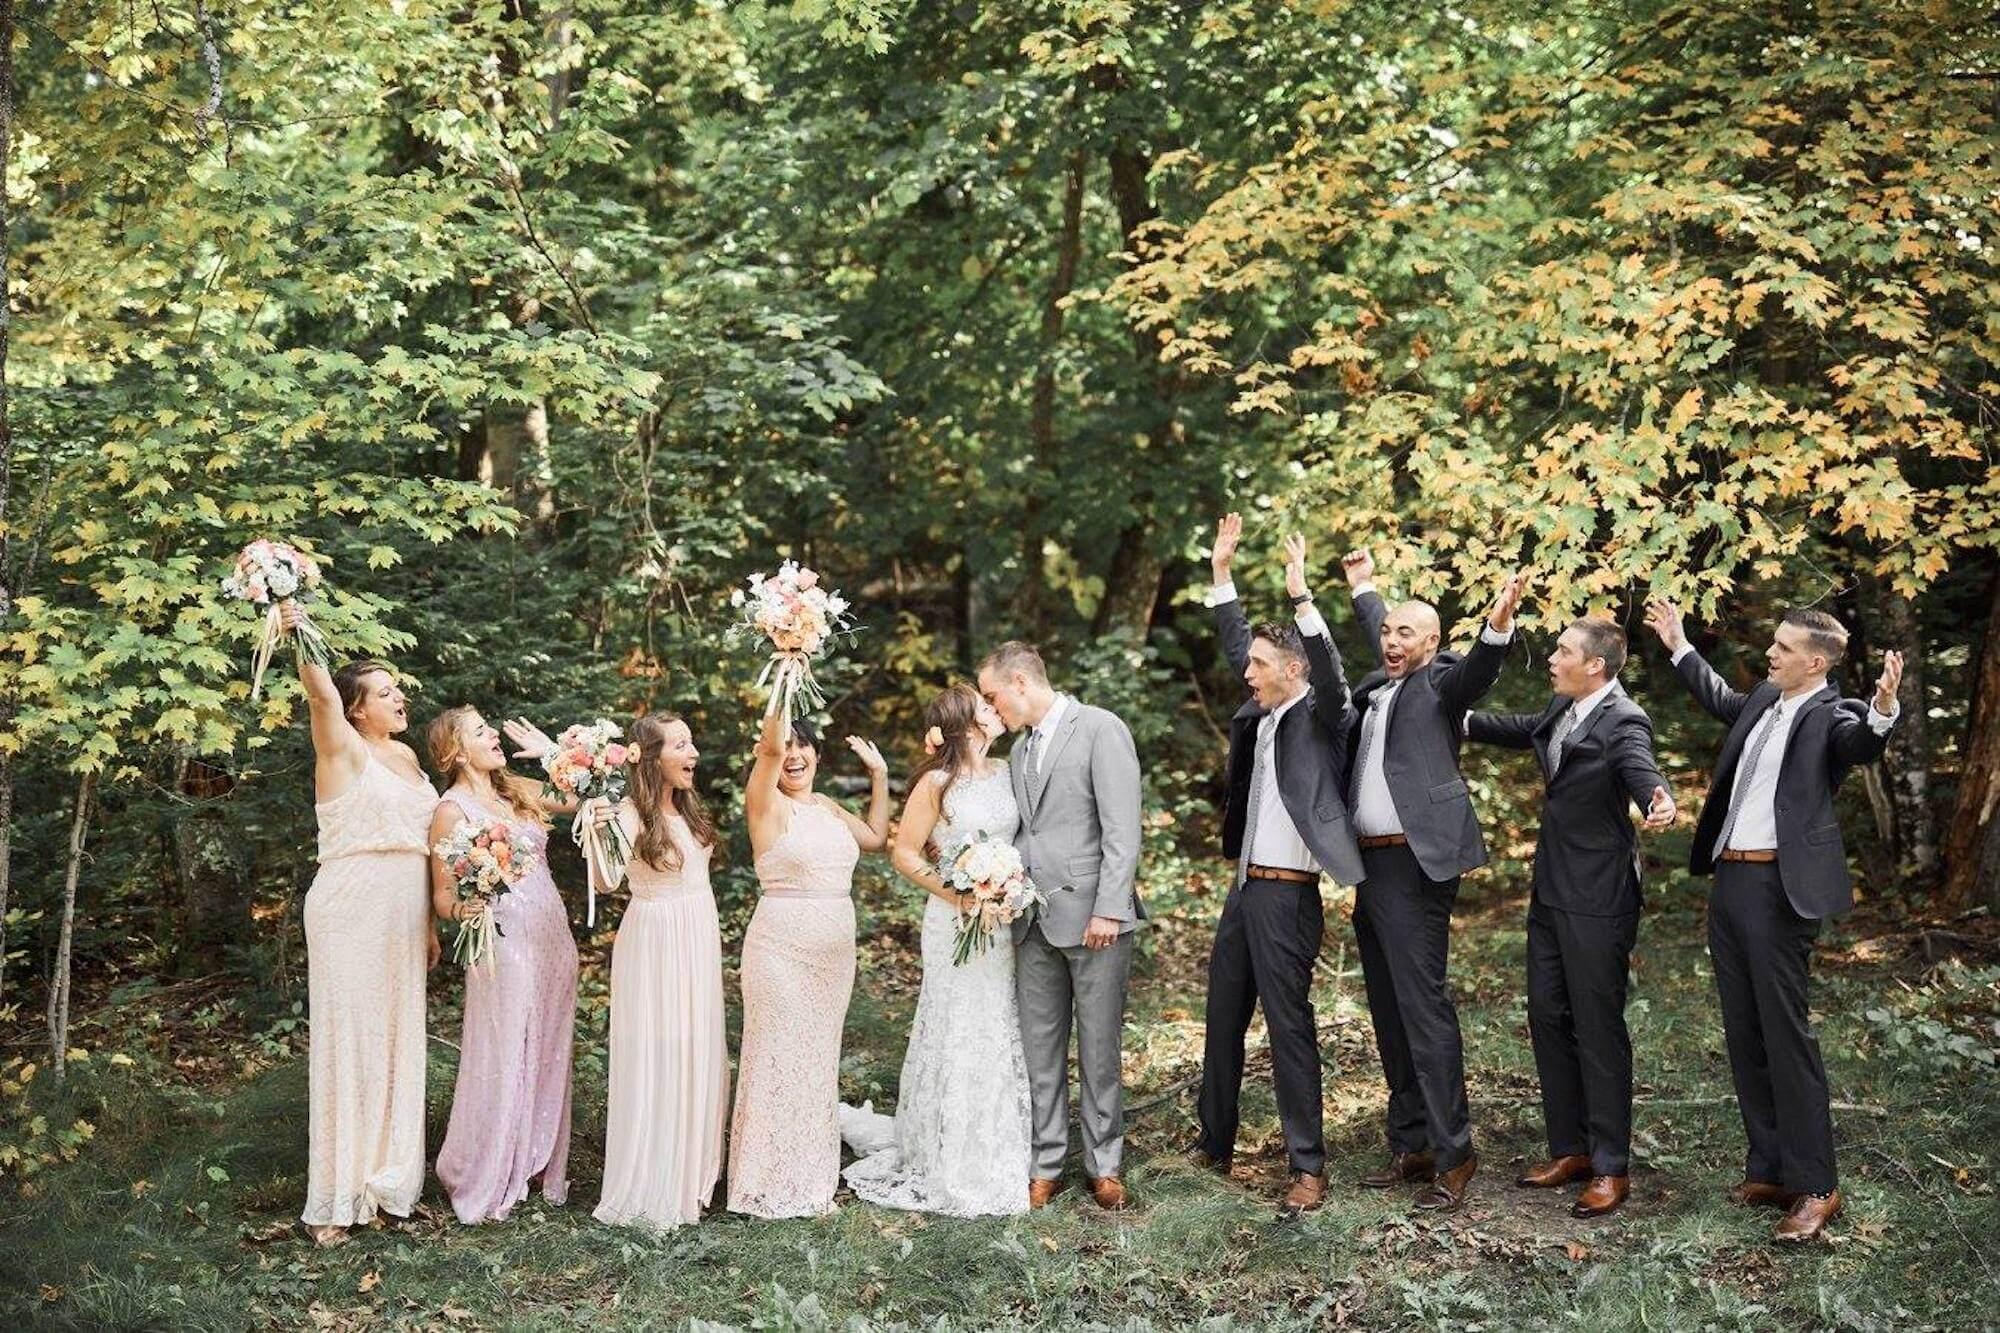 engle-olson-wedding-video-perry-james-photography-17.jpg